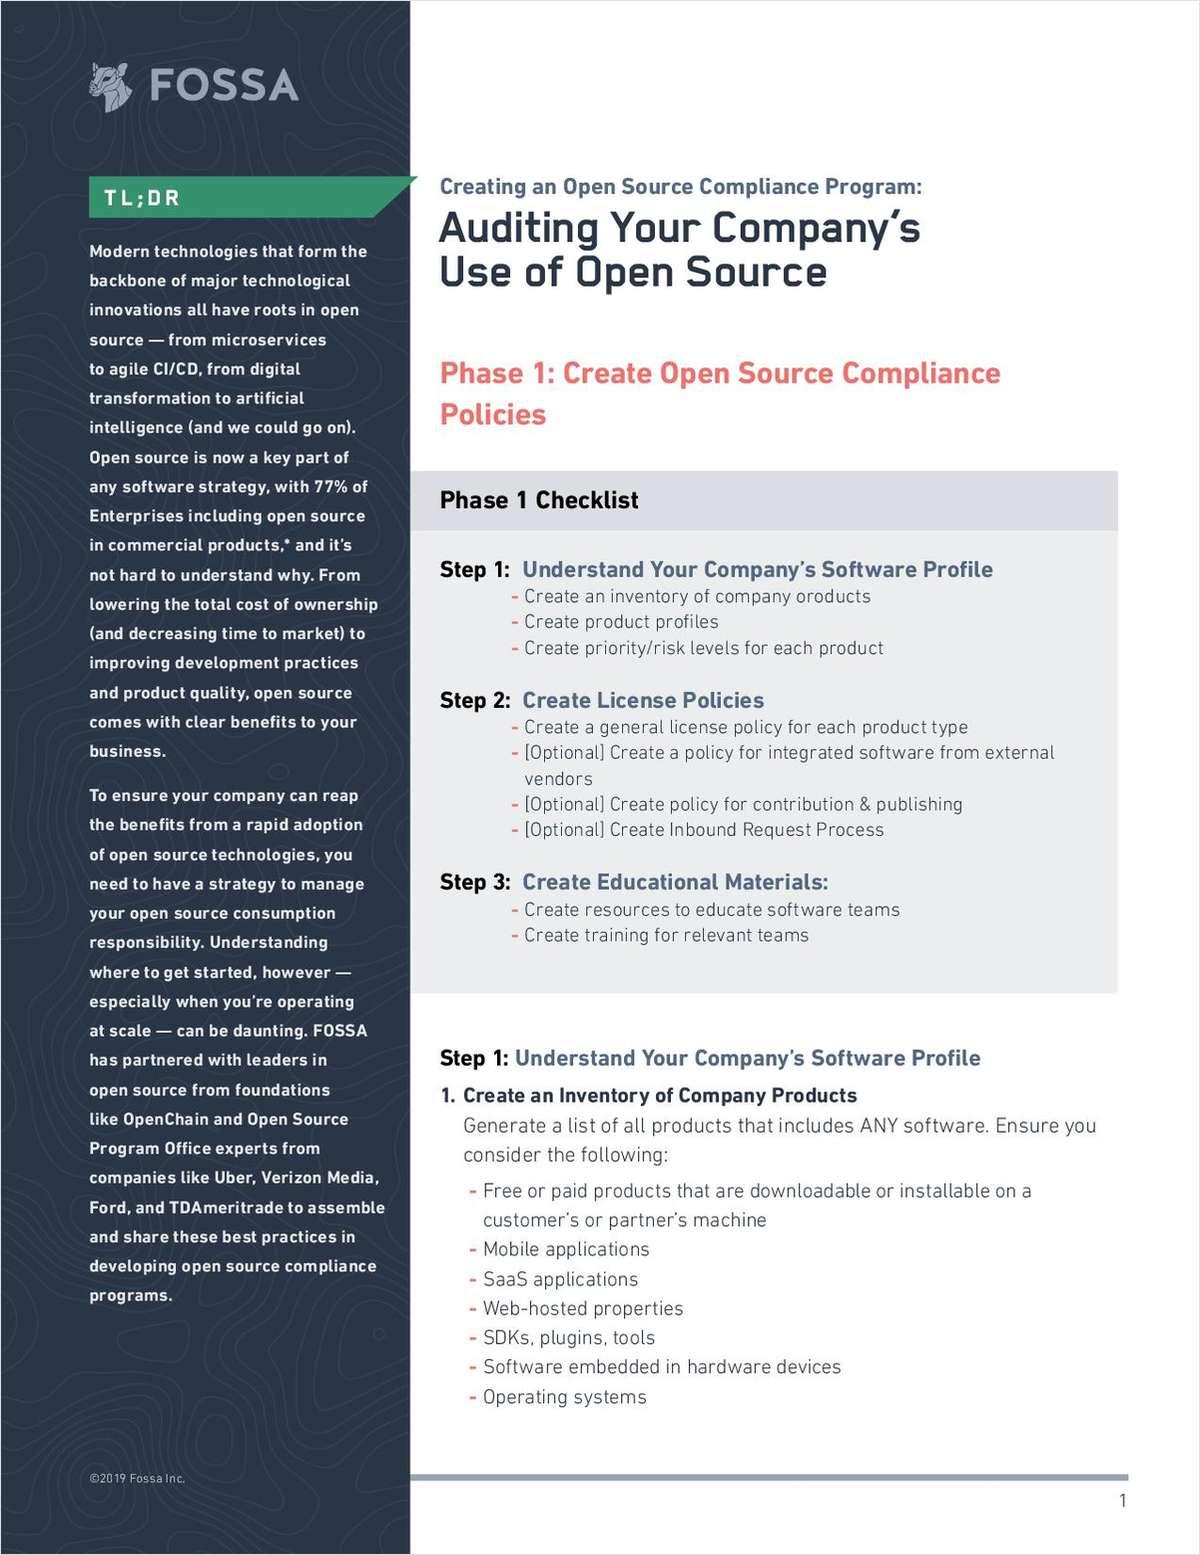 Open Source Compliance Program Checklist